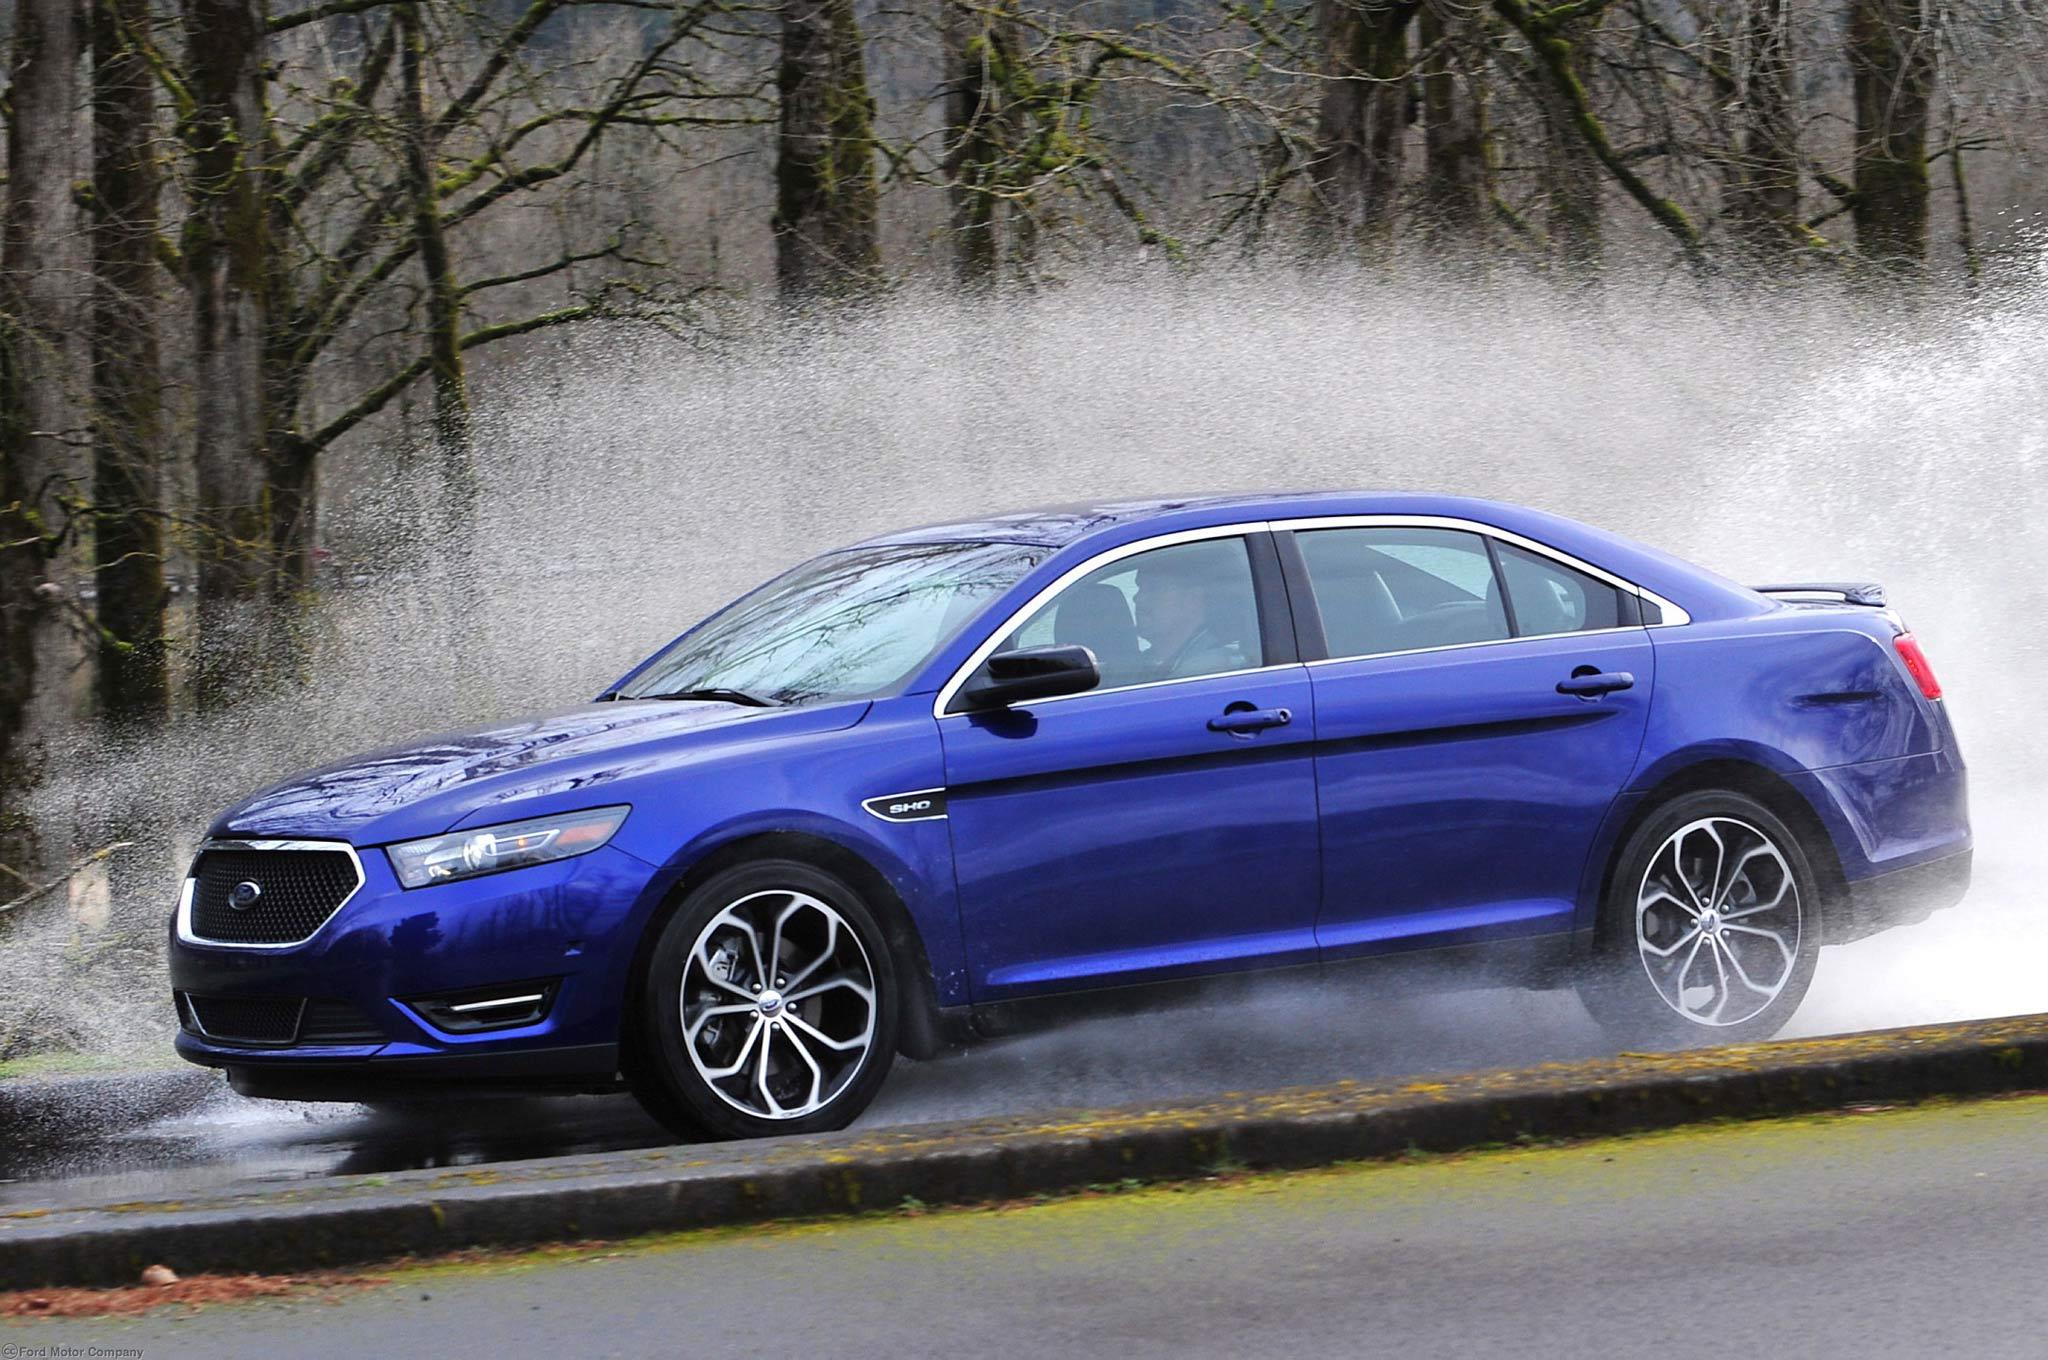 2019 Taurus Sho >> First Drive: 2013 Ford Taurus SHO Performance Package - Automobile Magazine